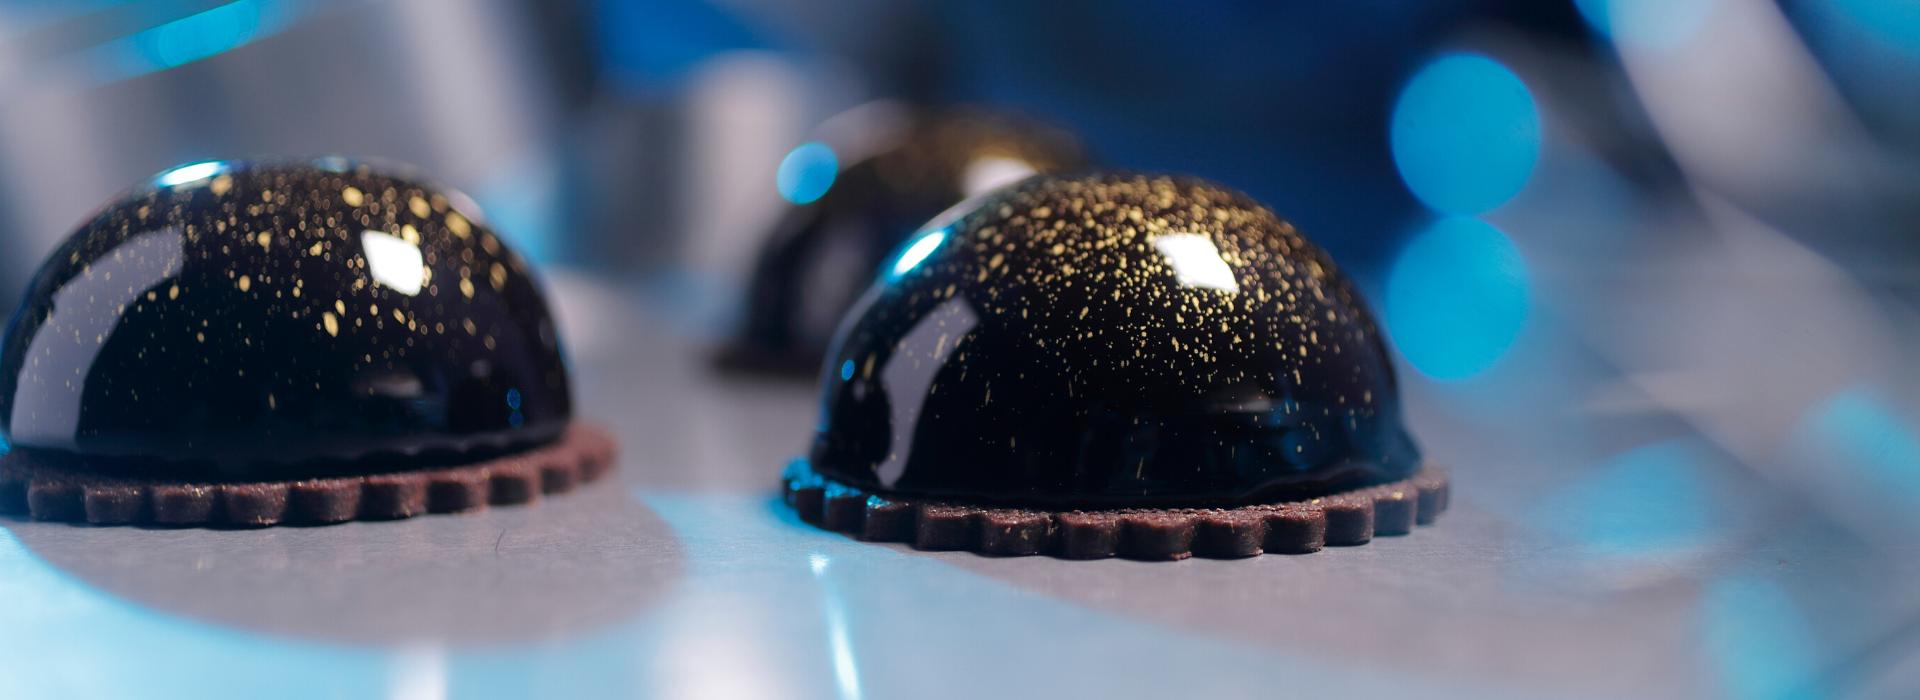 Videoricette Bakery Innovation: Parfait al cioccolato